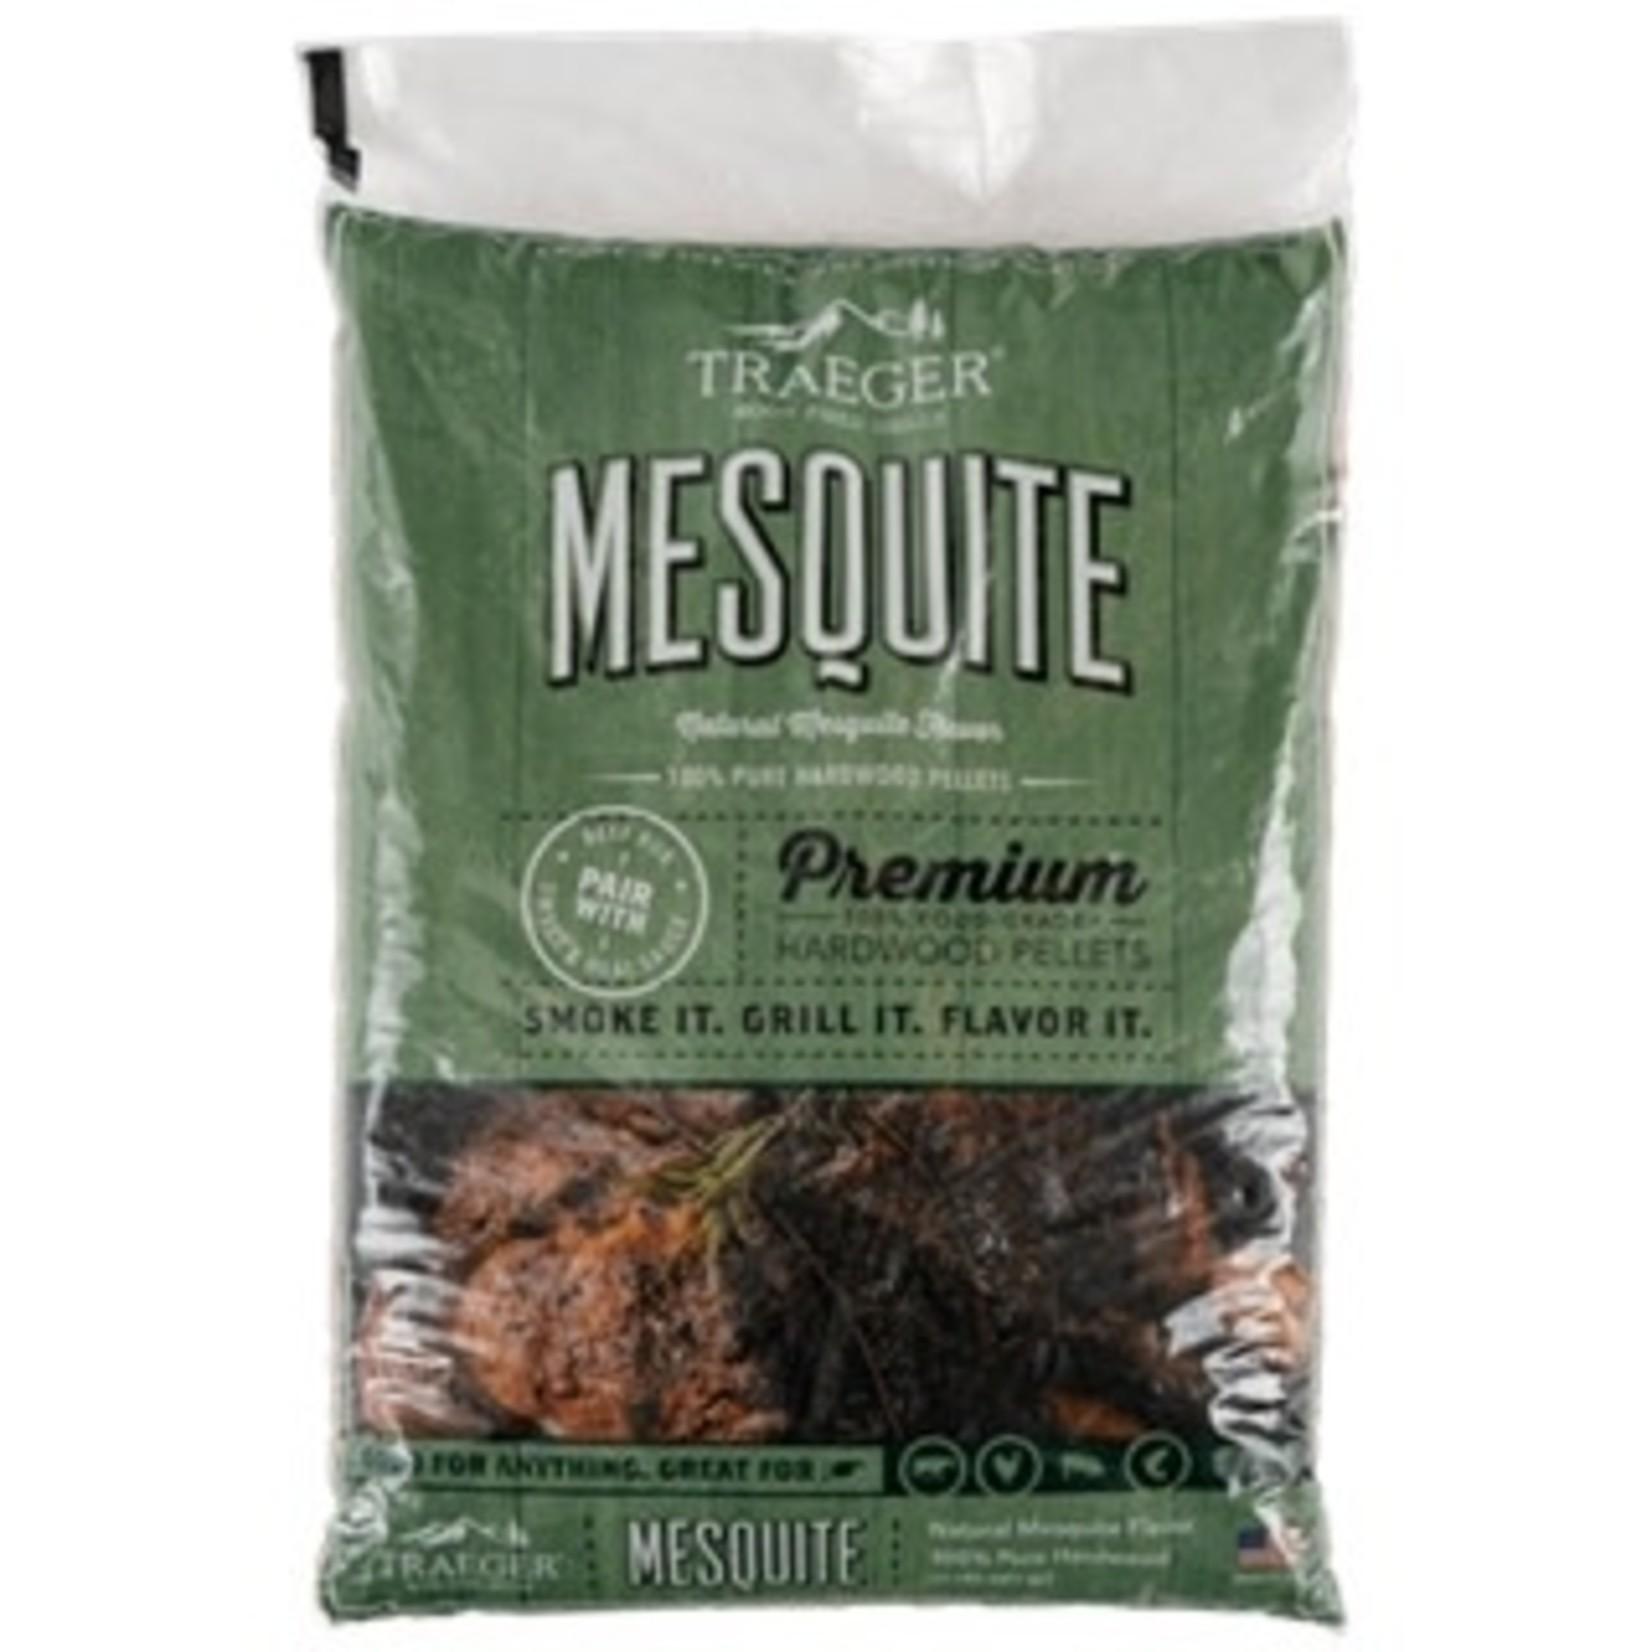 Traeger Traeger Mesquite pellets